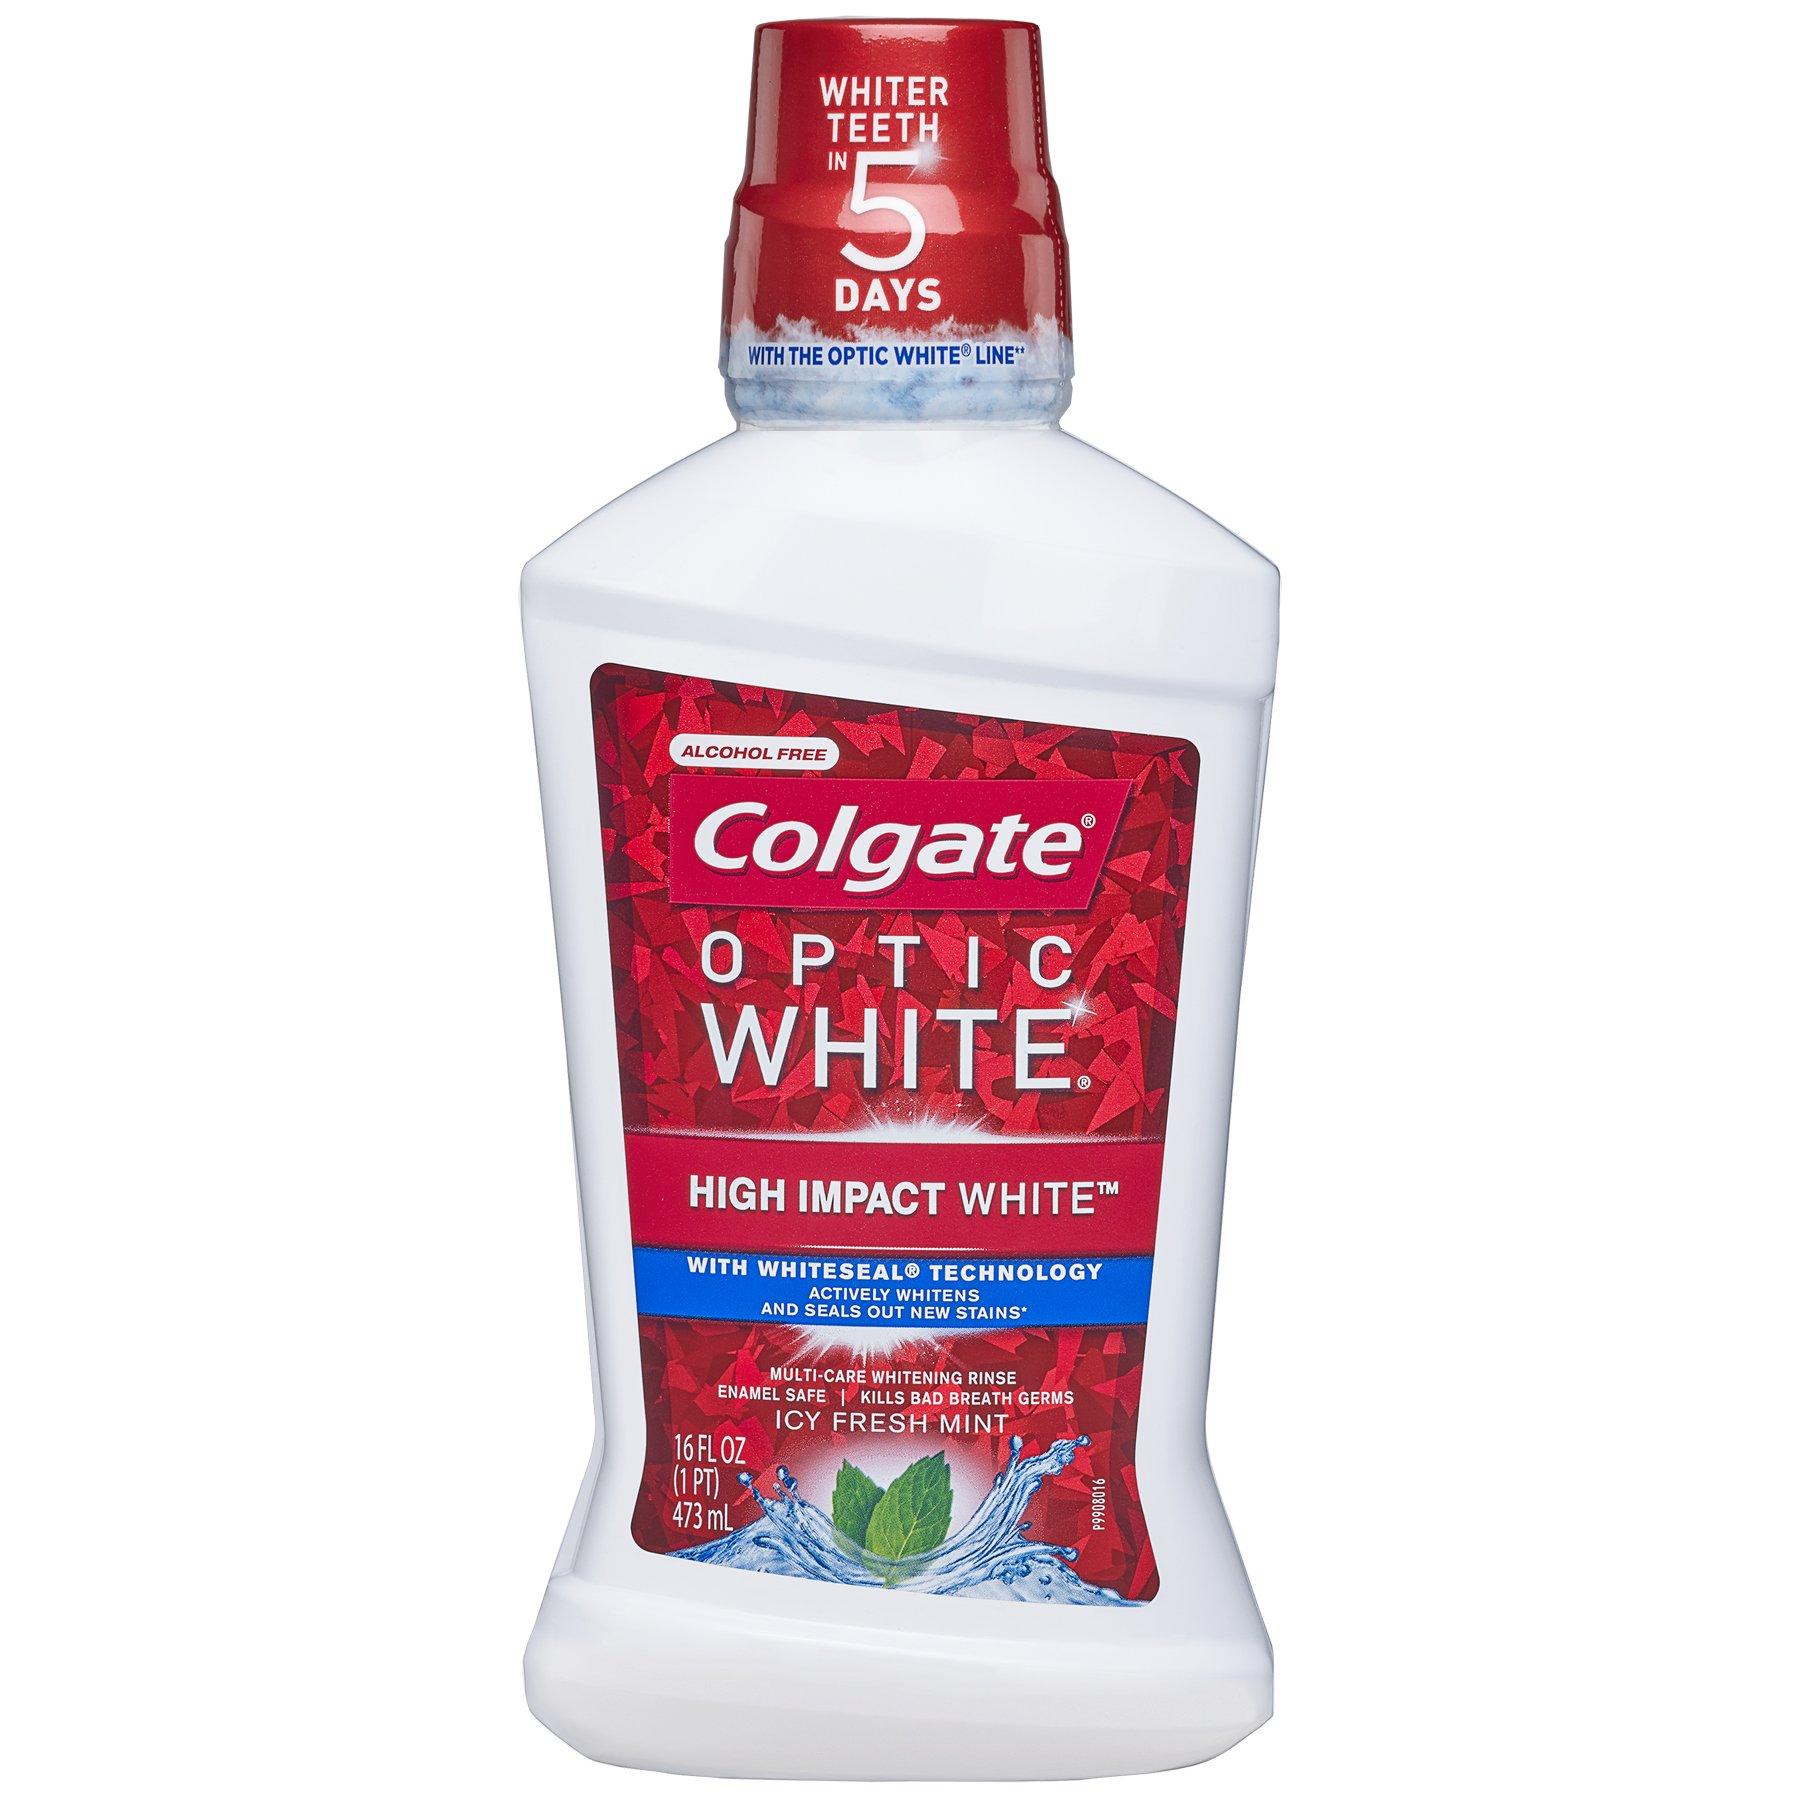 Colgate Optic White Whitening Mouthwash, Fresh Mint - 473 mL (6 Pack)